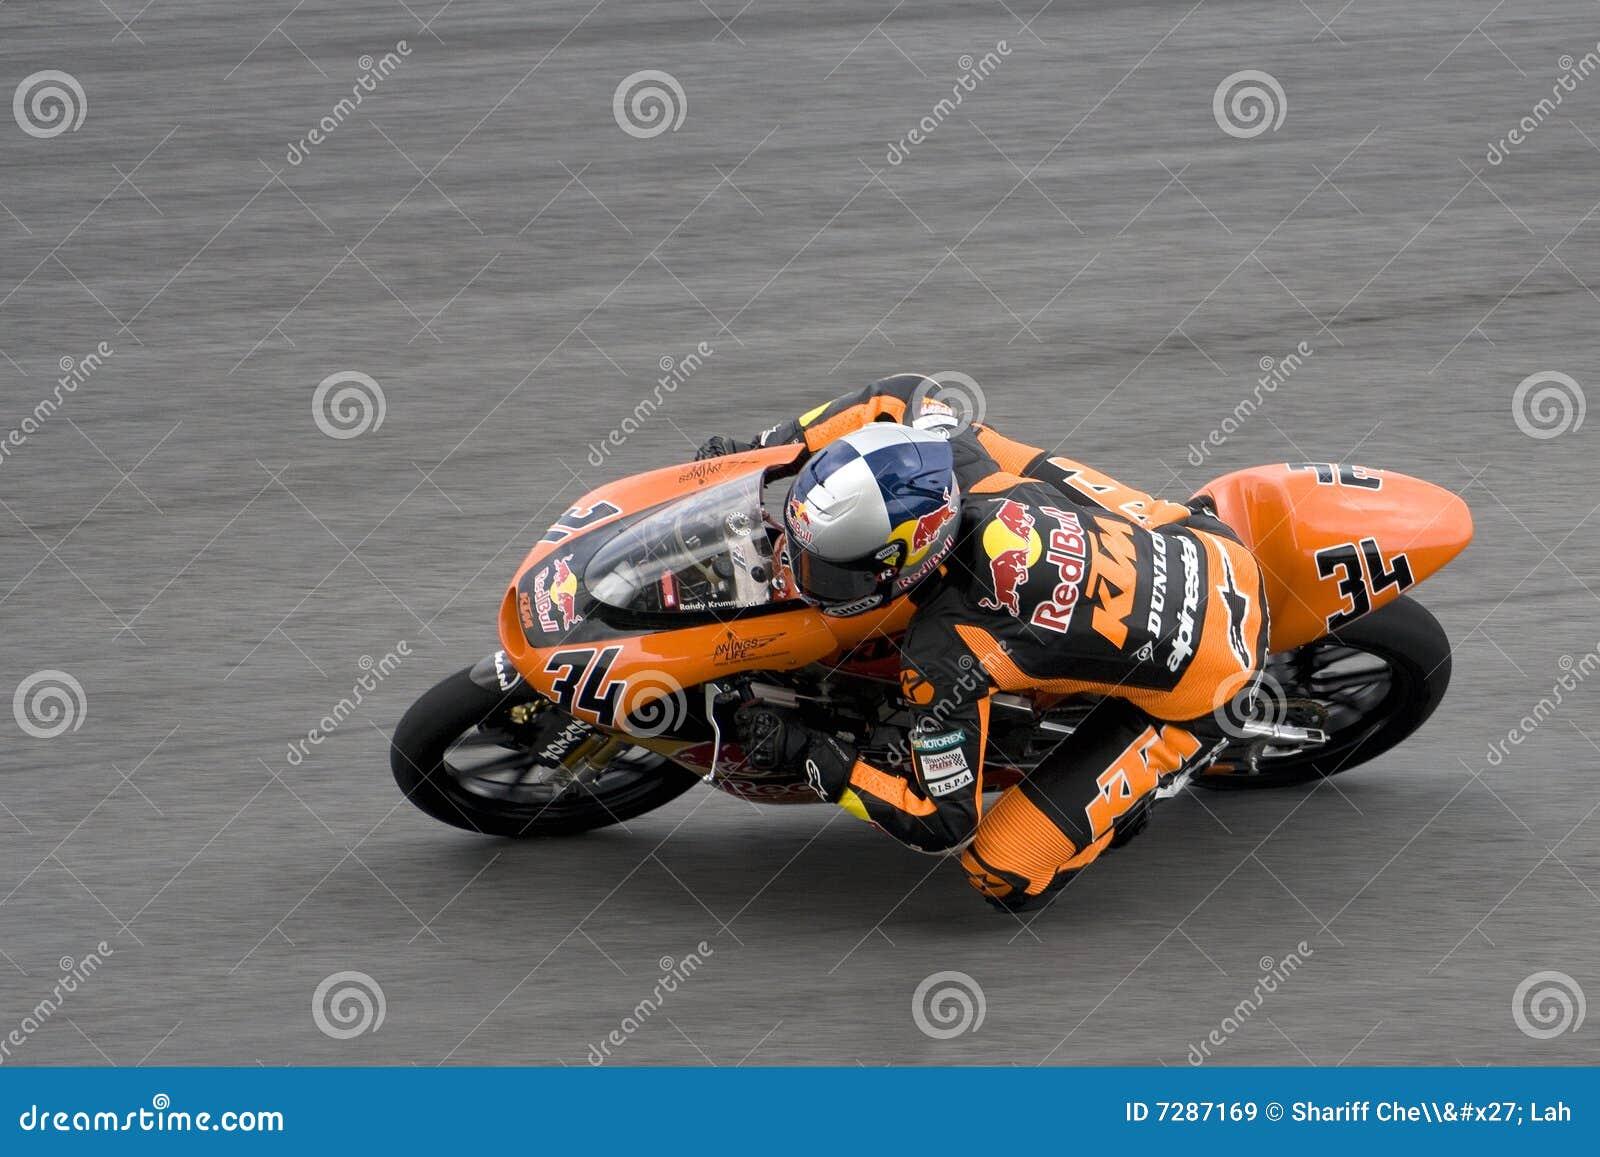 Motogp 125cc - Randy Krummenacher